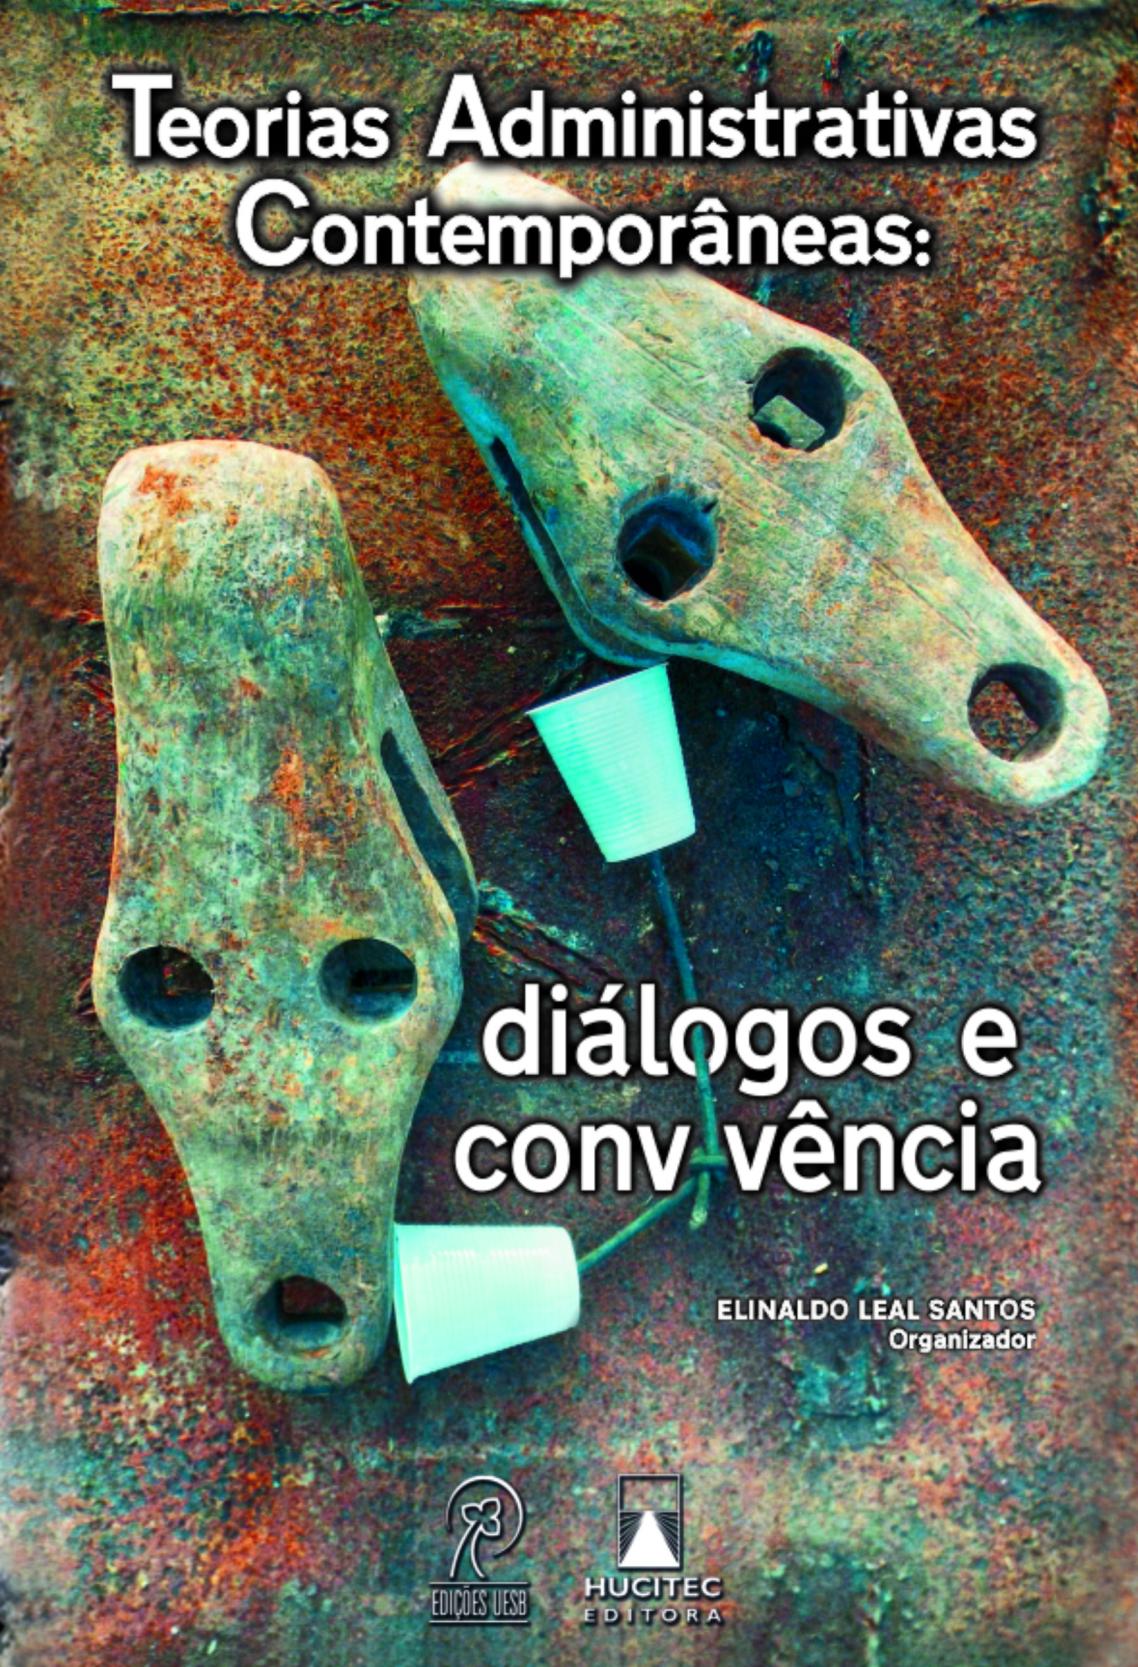 Teorias Administrativas Contemporaneas - Dialogos E Convivencia, livro de Elinaldo Leal Santos